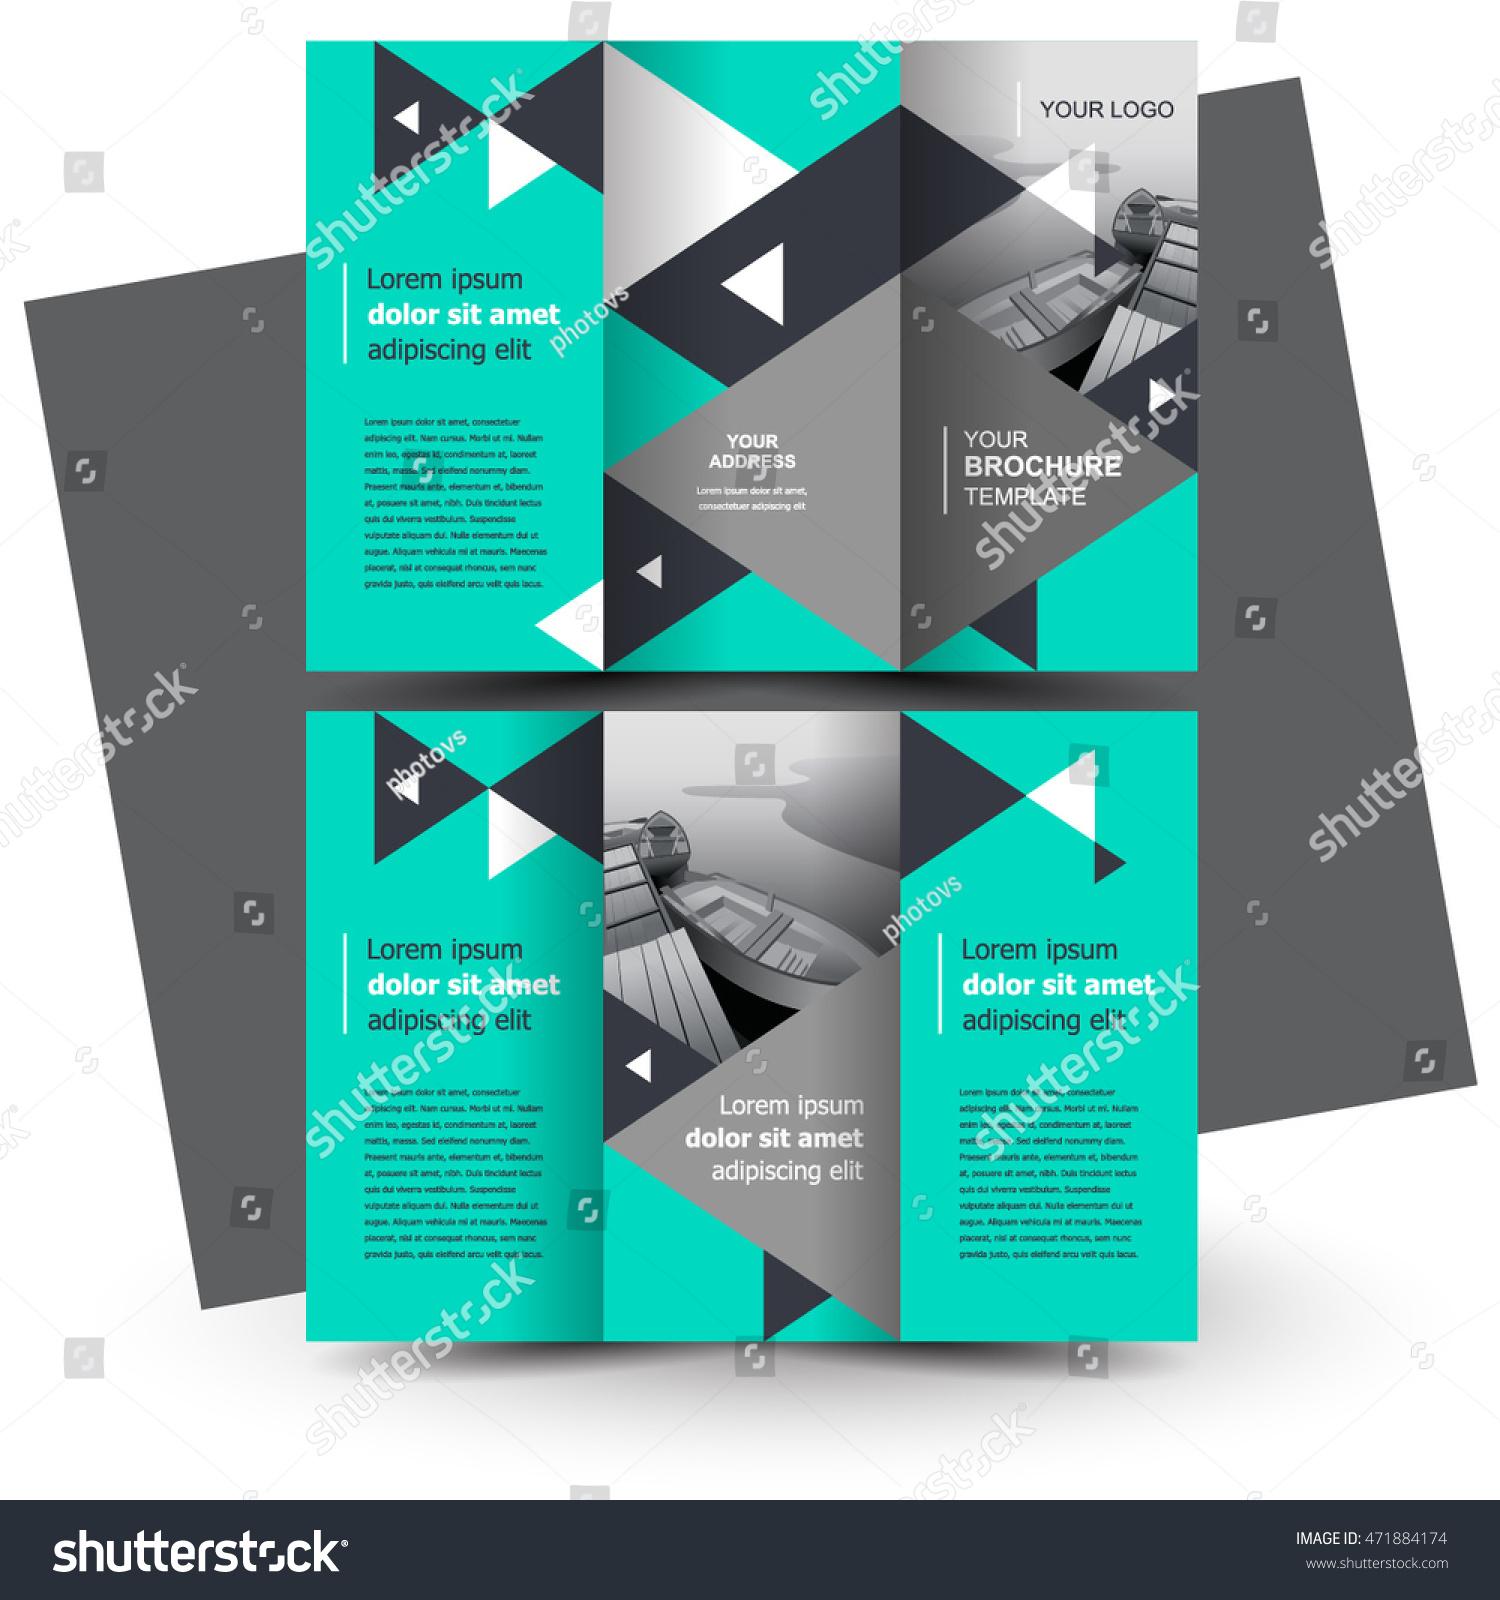 Business brochure design solarfm professional corporate tri fold brochure free psd template friedricerecipe Gallery